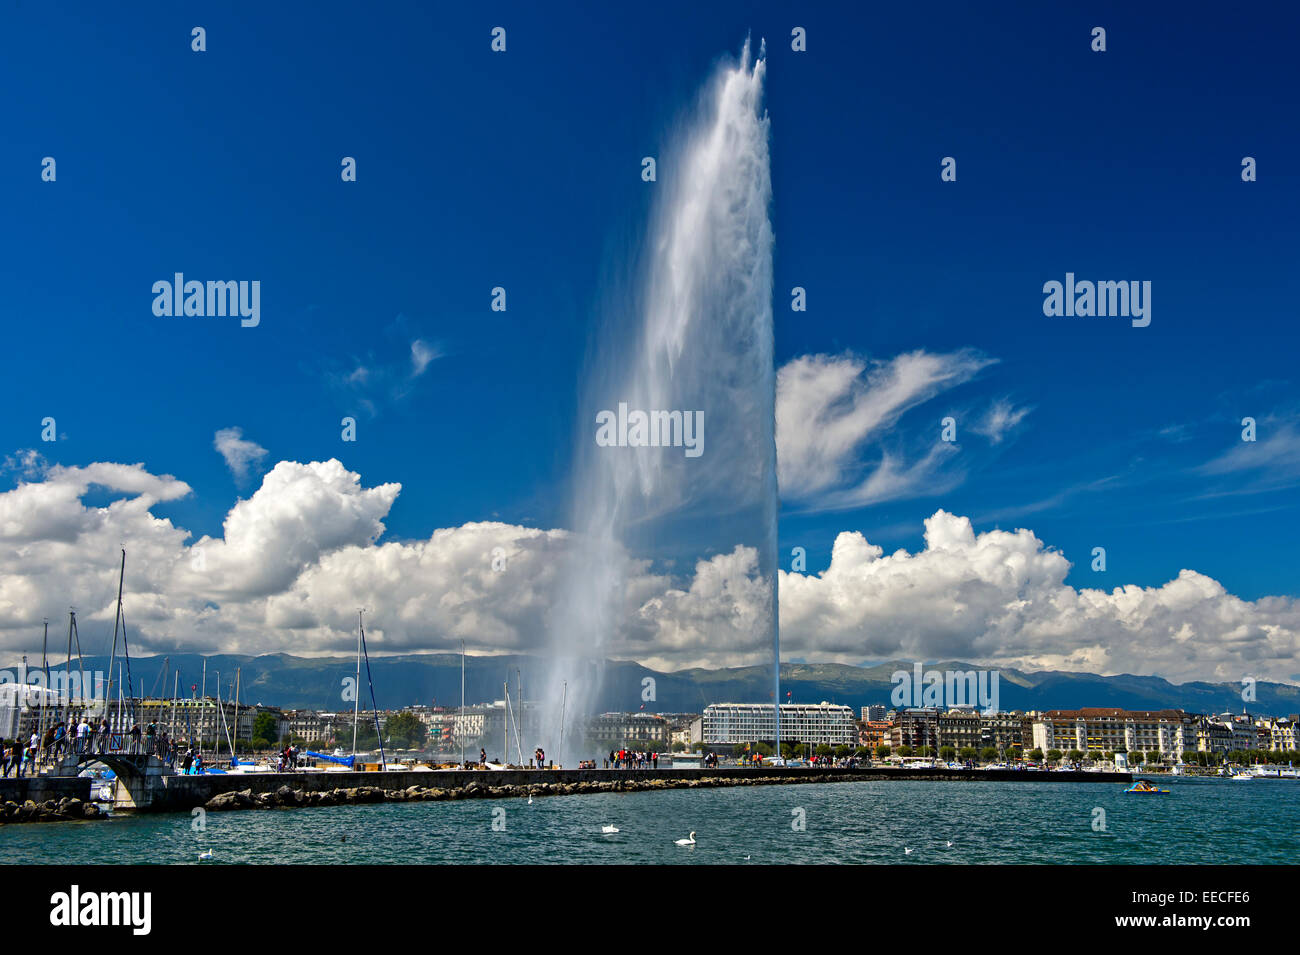 The giant fountain Jet d'eau in the Rade port area, Geneva, Switzerland - Stock Image